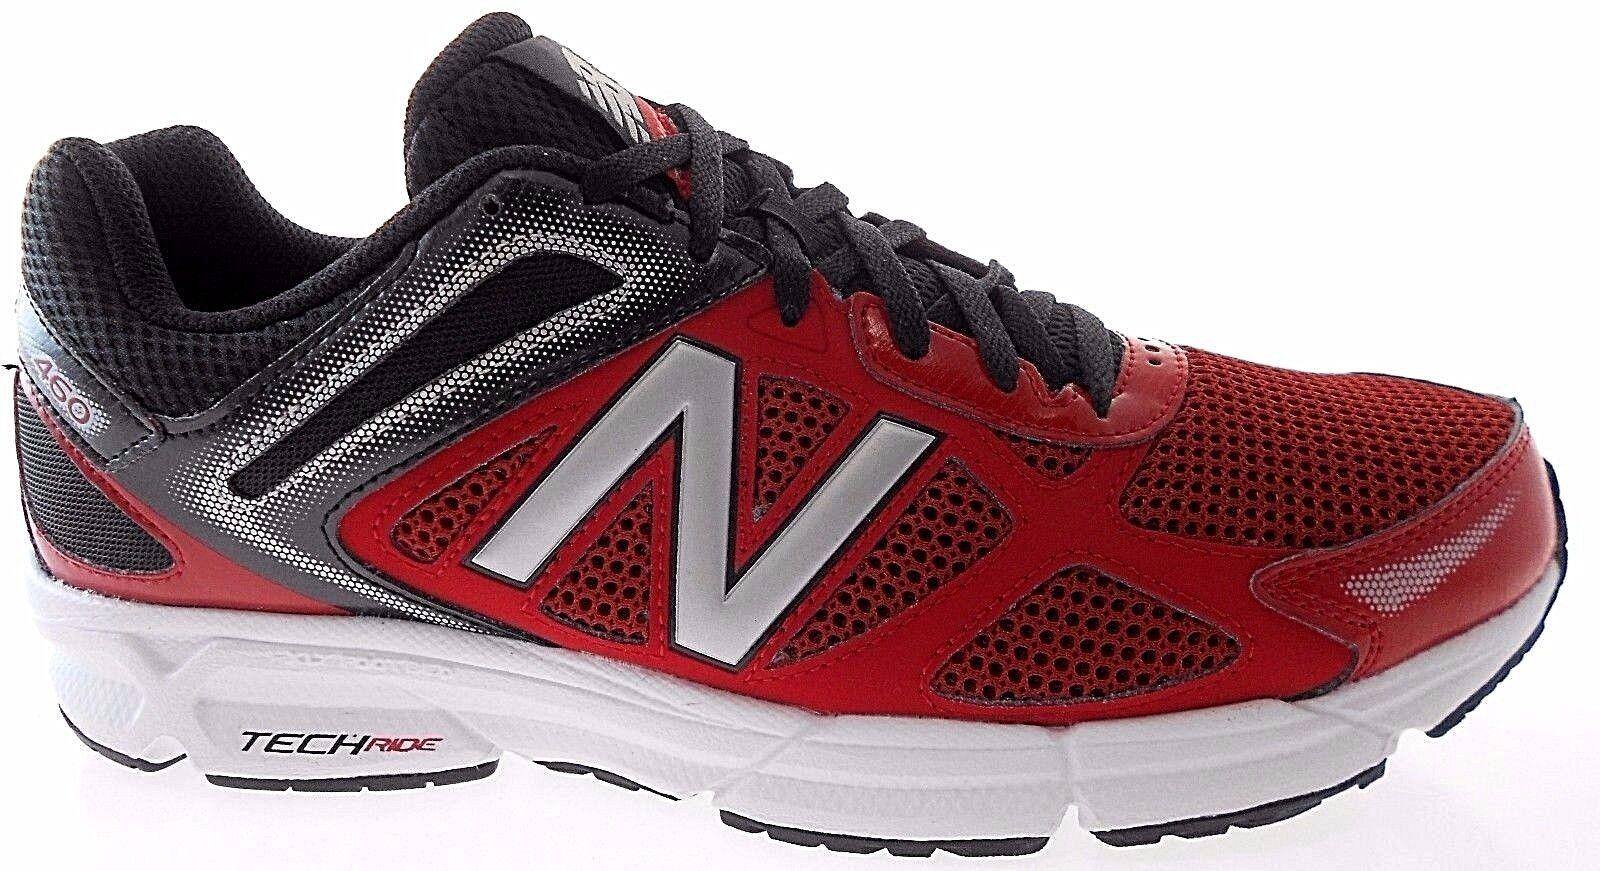 New Balance m460lr1 Ride hombres rojo / plata Tech Ride m460lr1 corriendo zapatos e3acd3